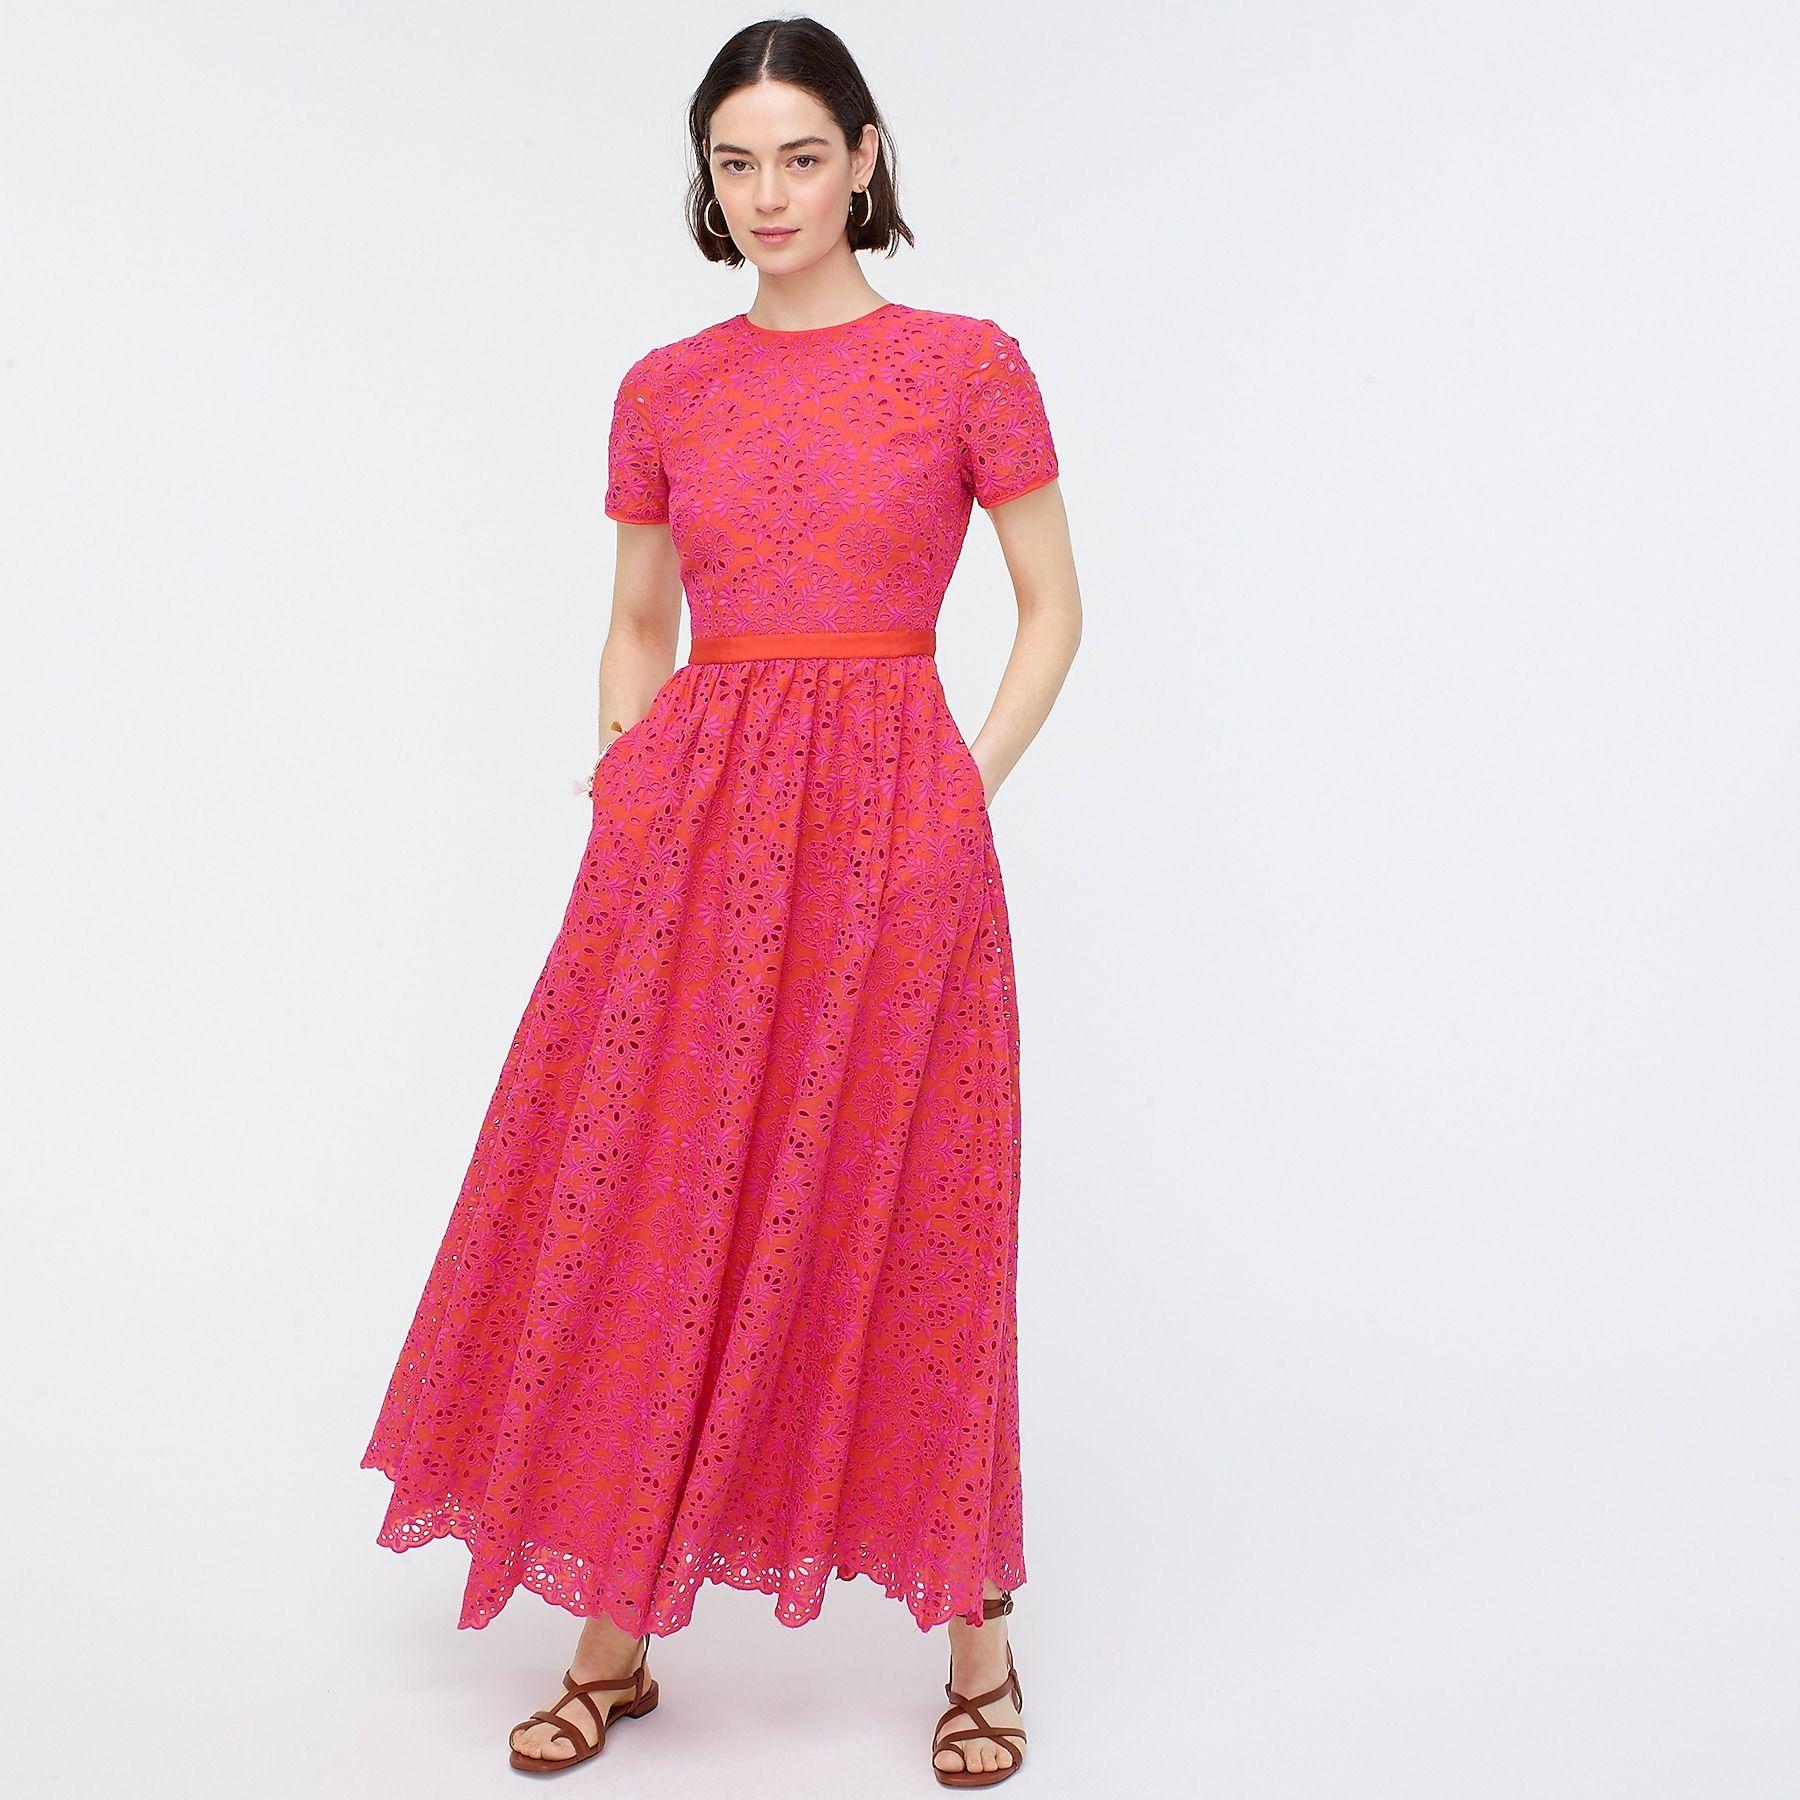 Short Sleeve Maxi Dress In Eyelet Womens Maxi Dresses Short Sleeve Maxi Dresses Maxi Dress With Sleeves [ 1800 x 1800 Pixel ]